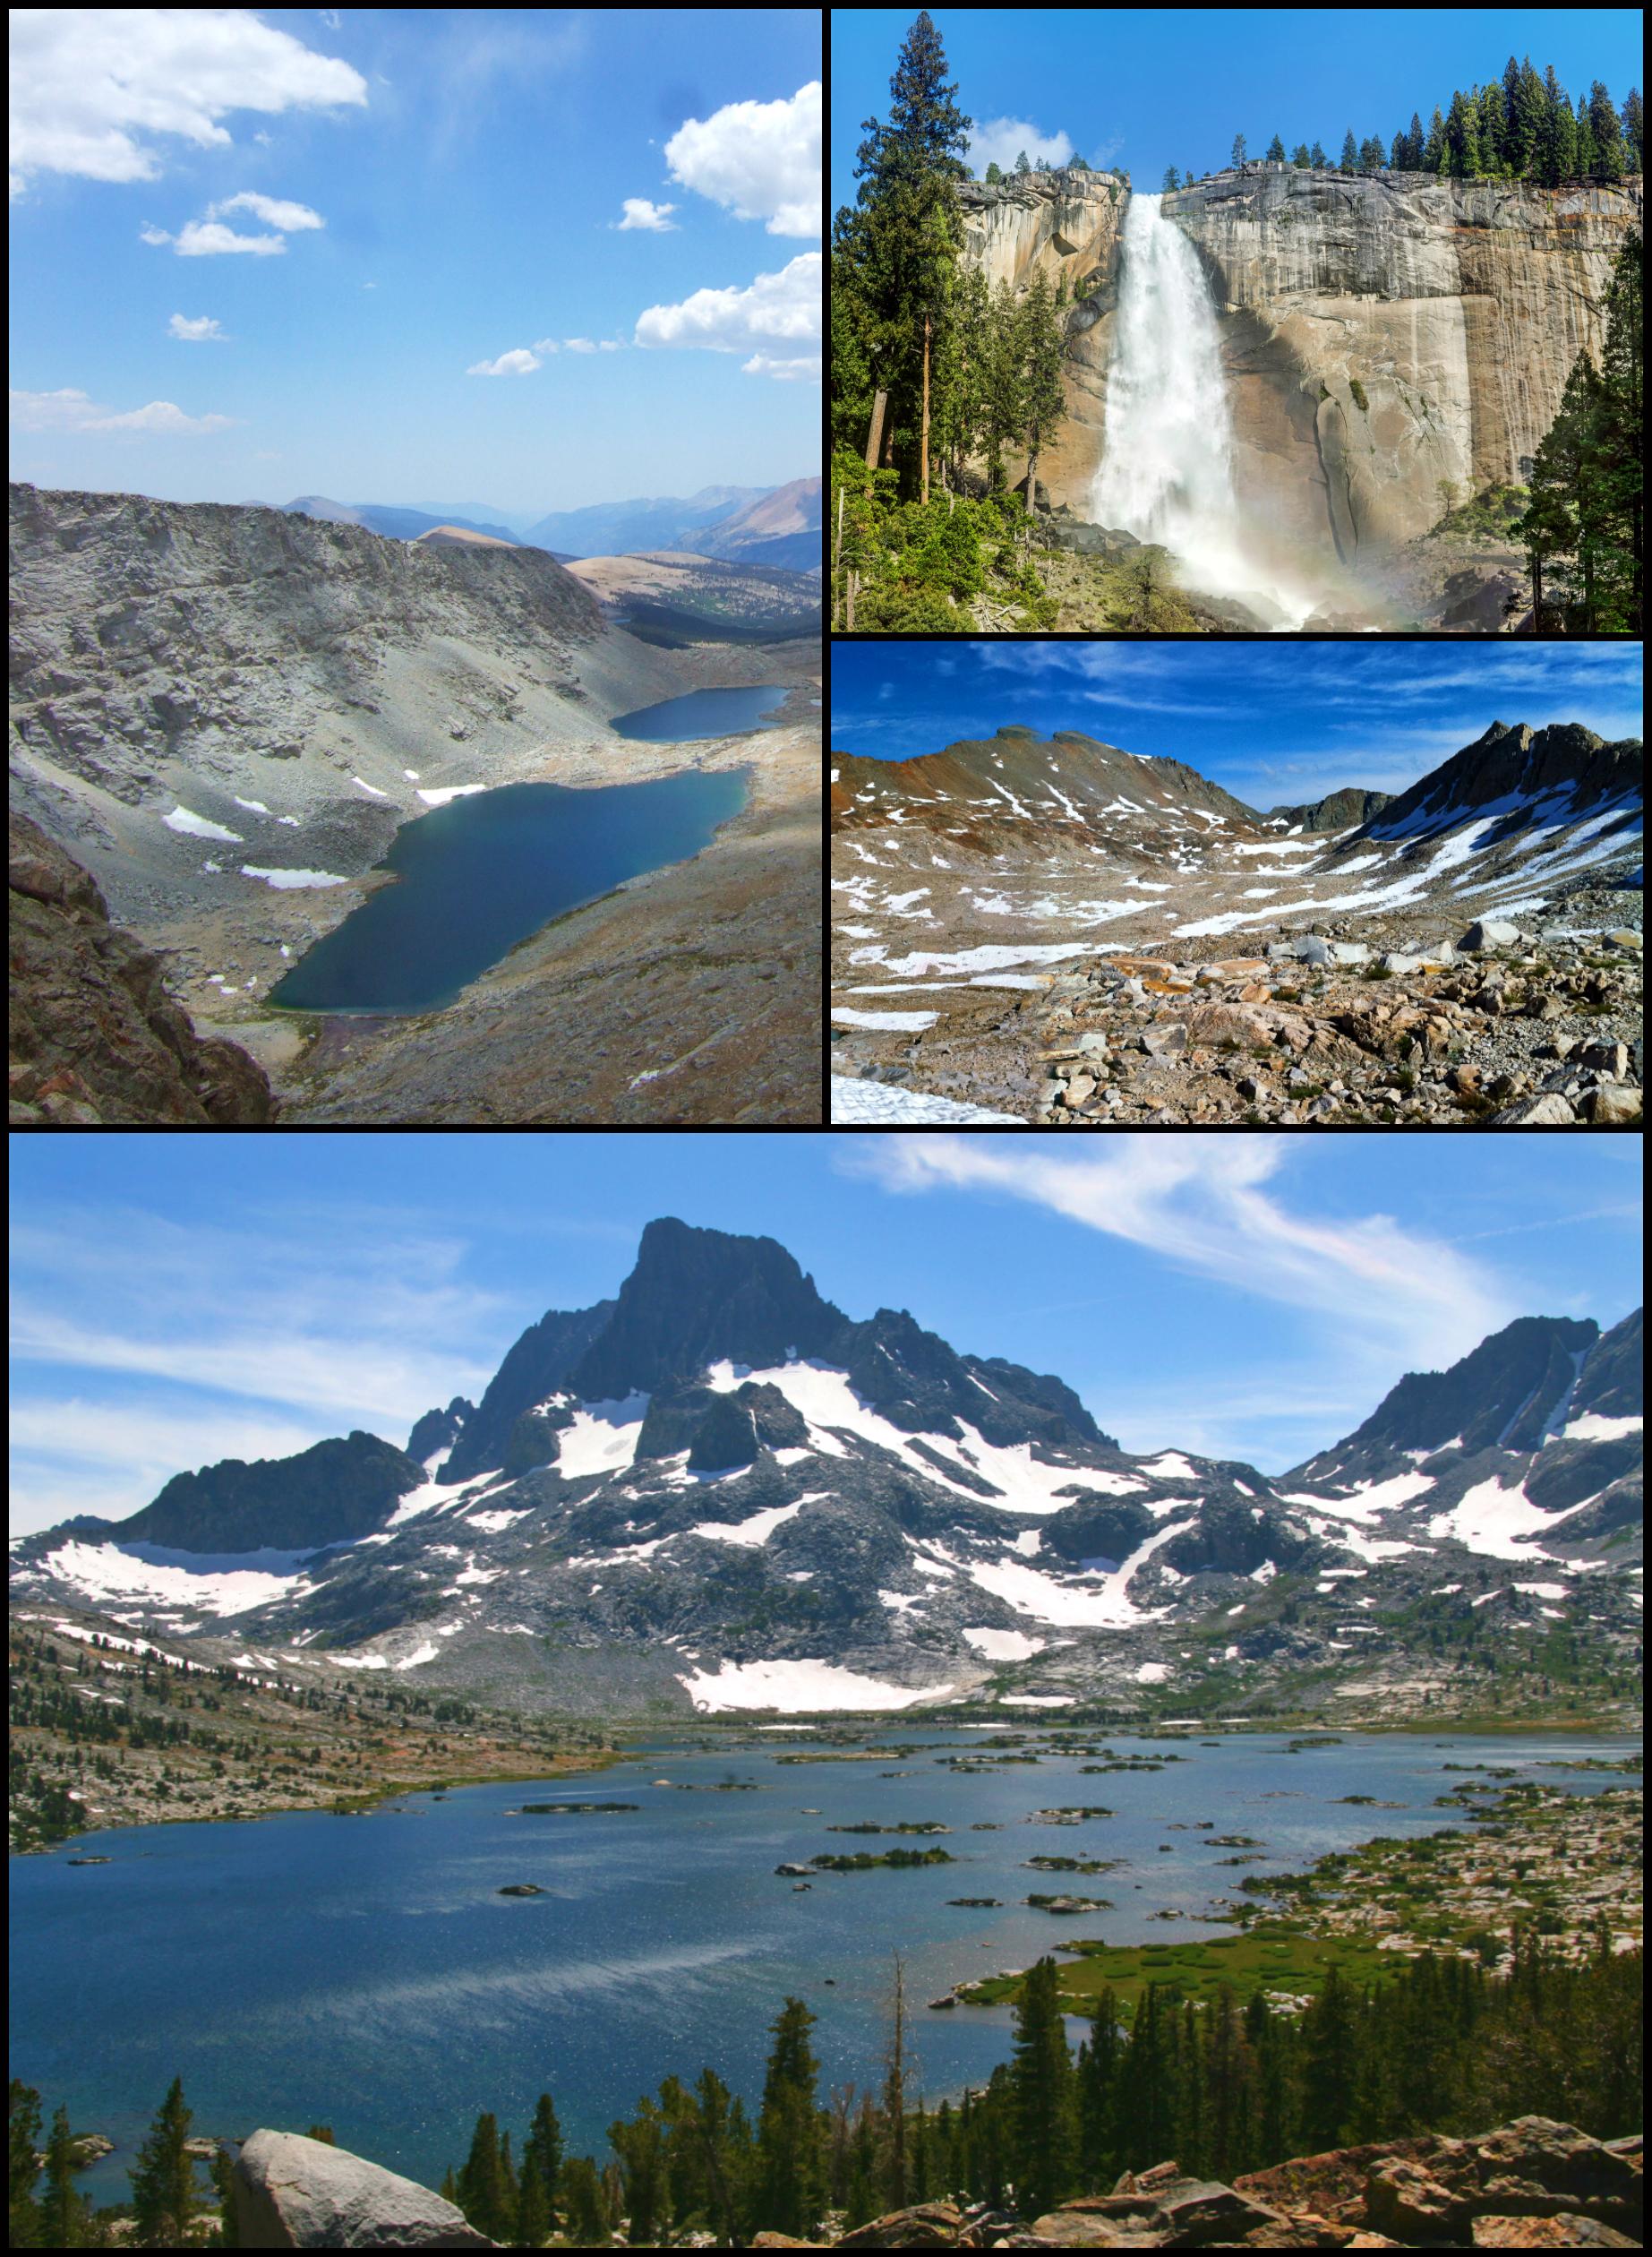 John Muir Trail Packing List Guide